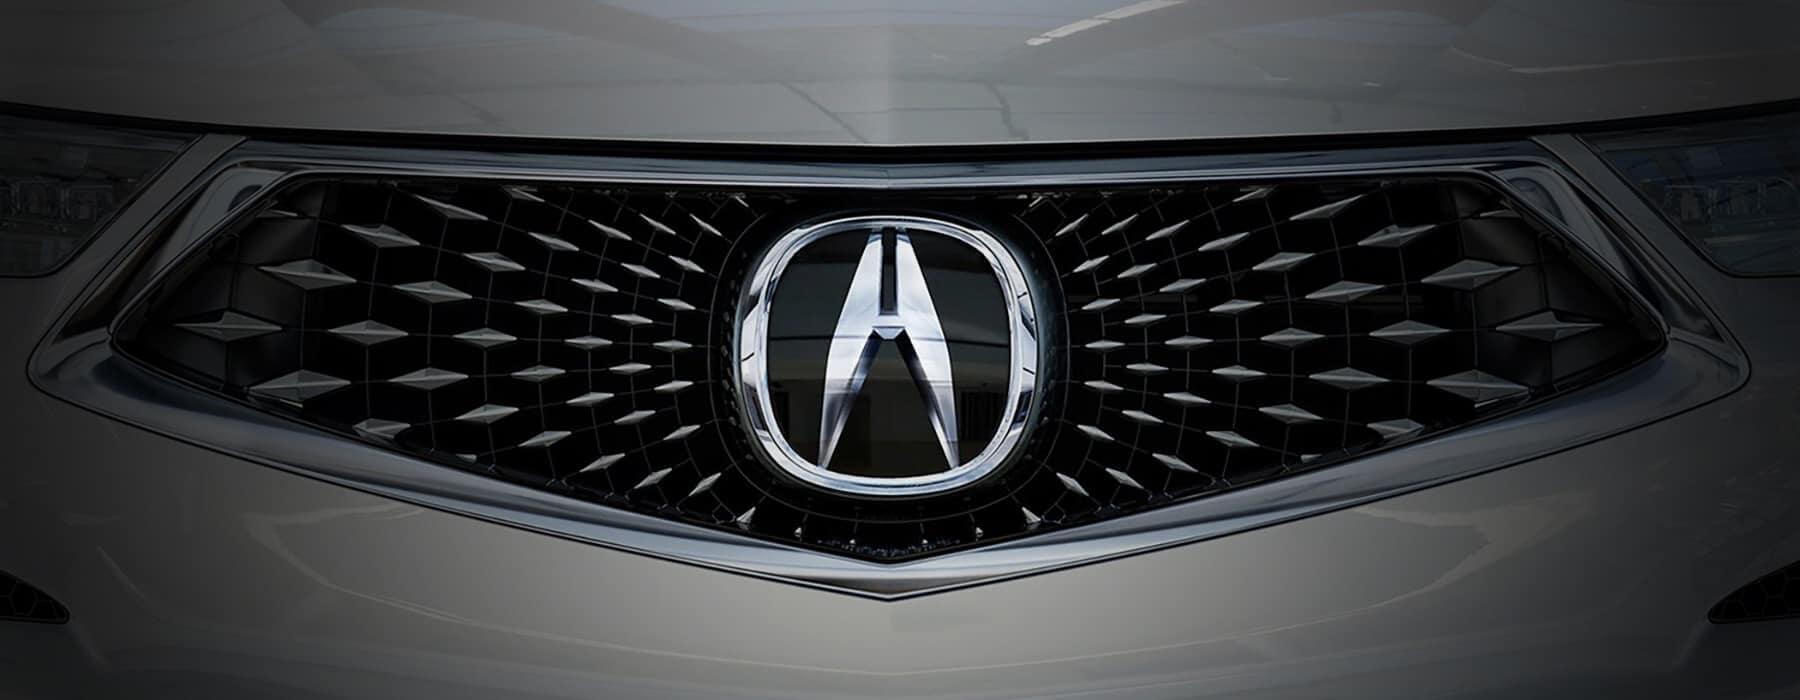 Acura Loyalty Program Sioux Falls Slider